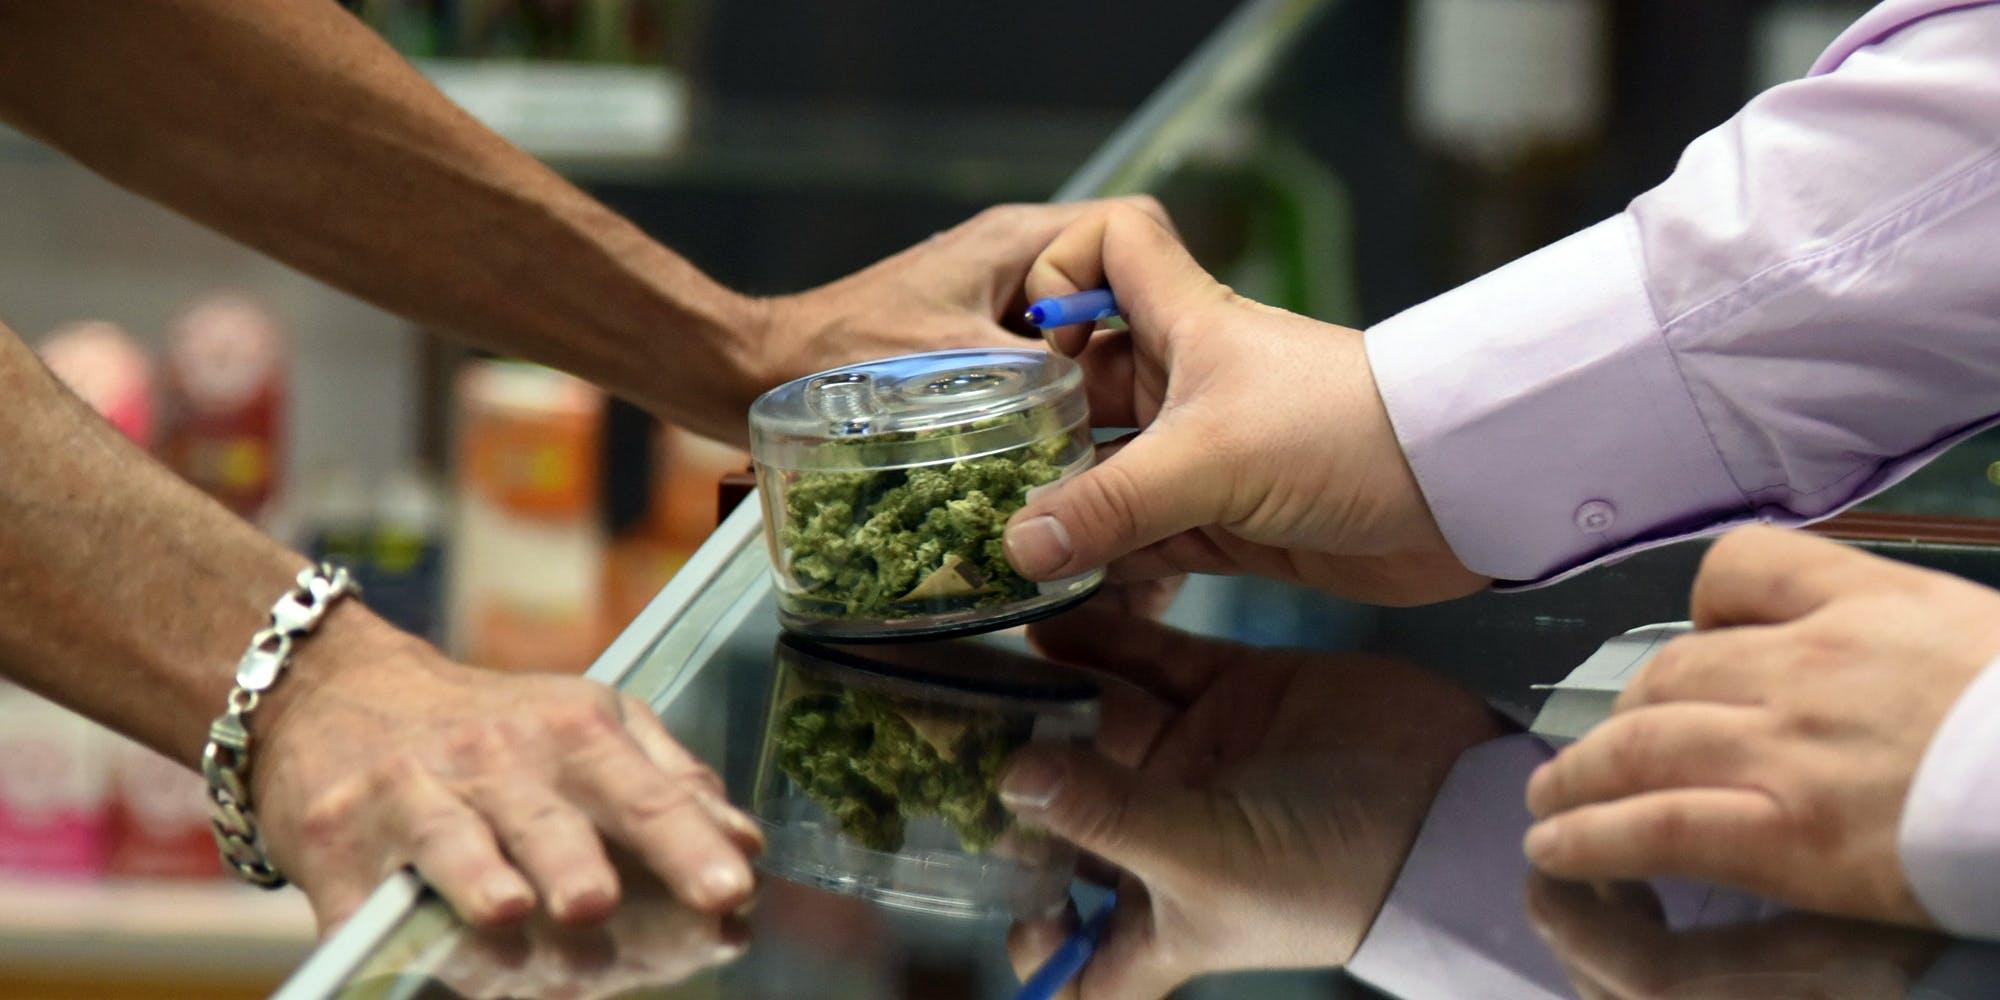 Only 1 in 7 California Cities Allow Recreational Marijuana Sales